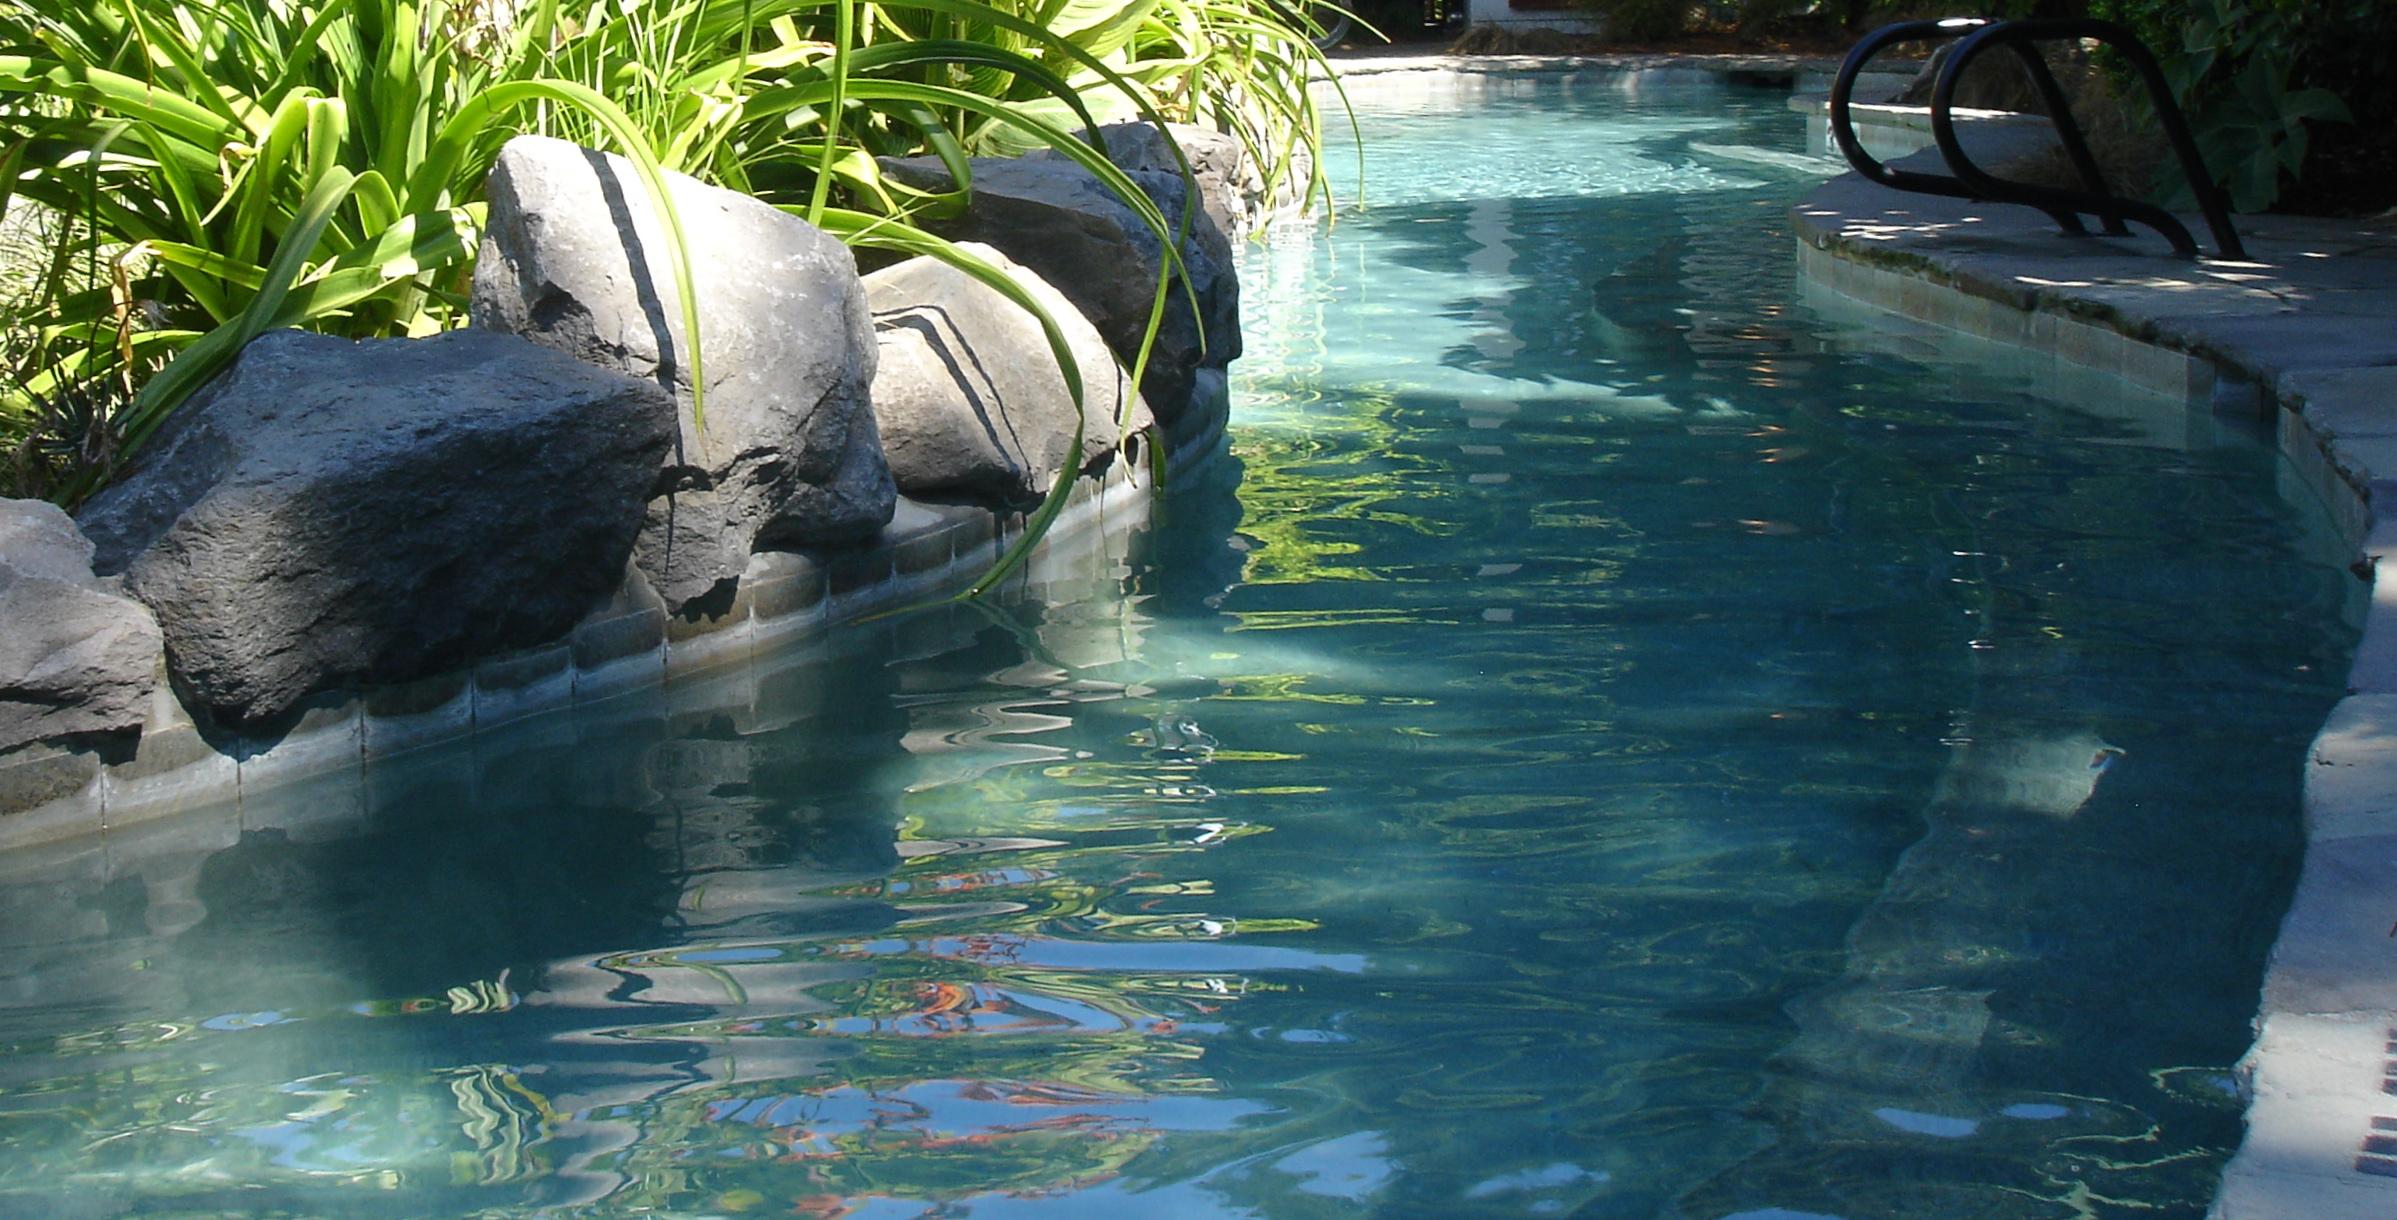 Droitwich Spa pool